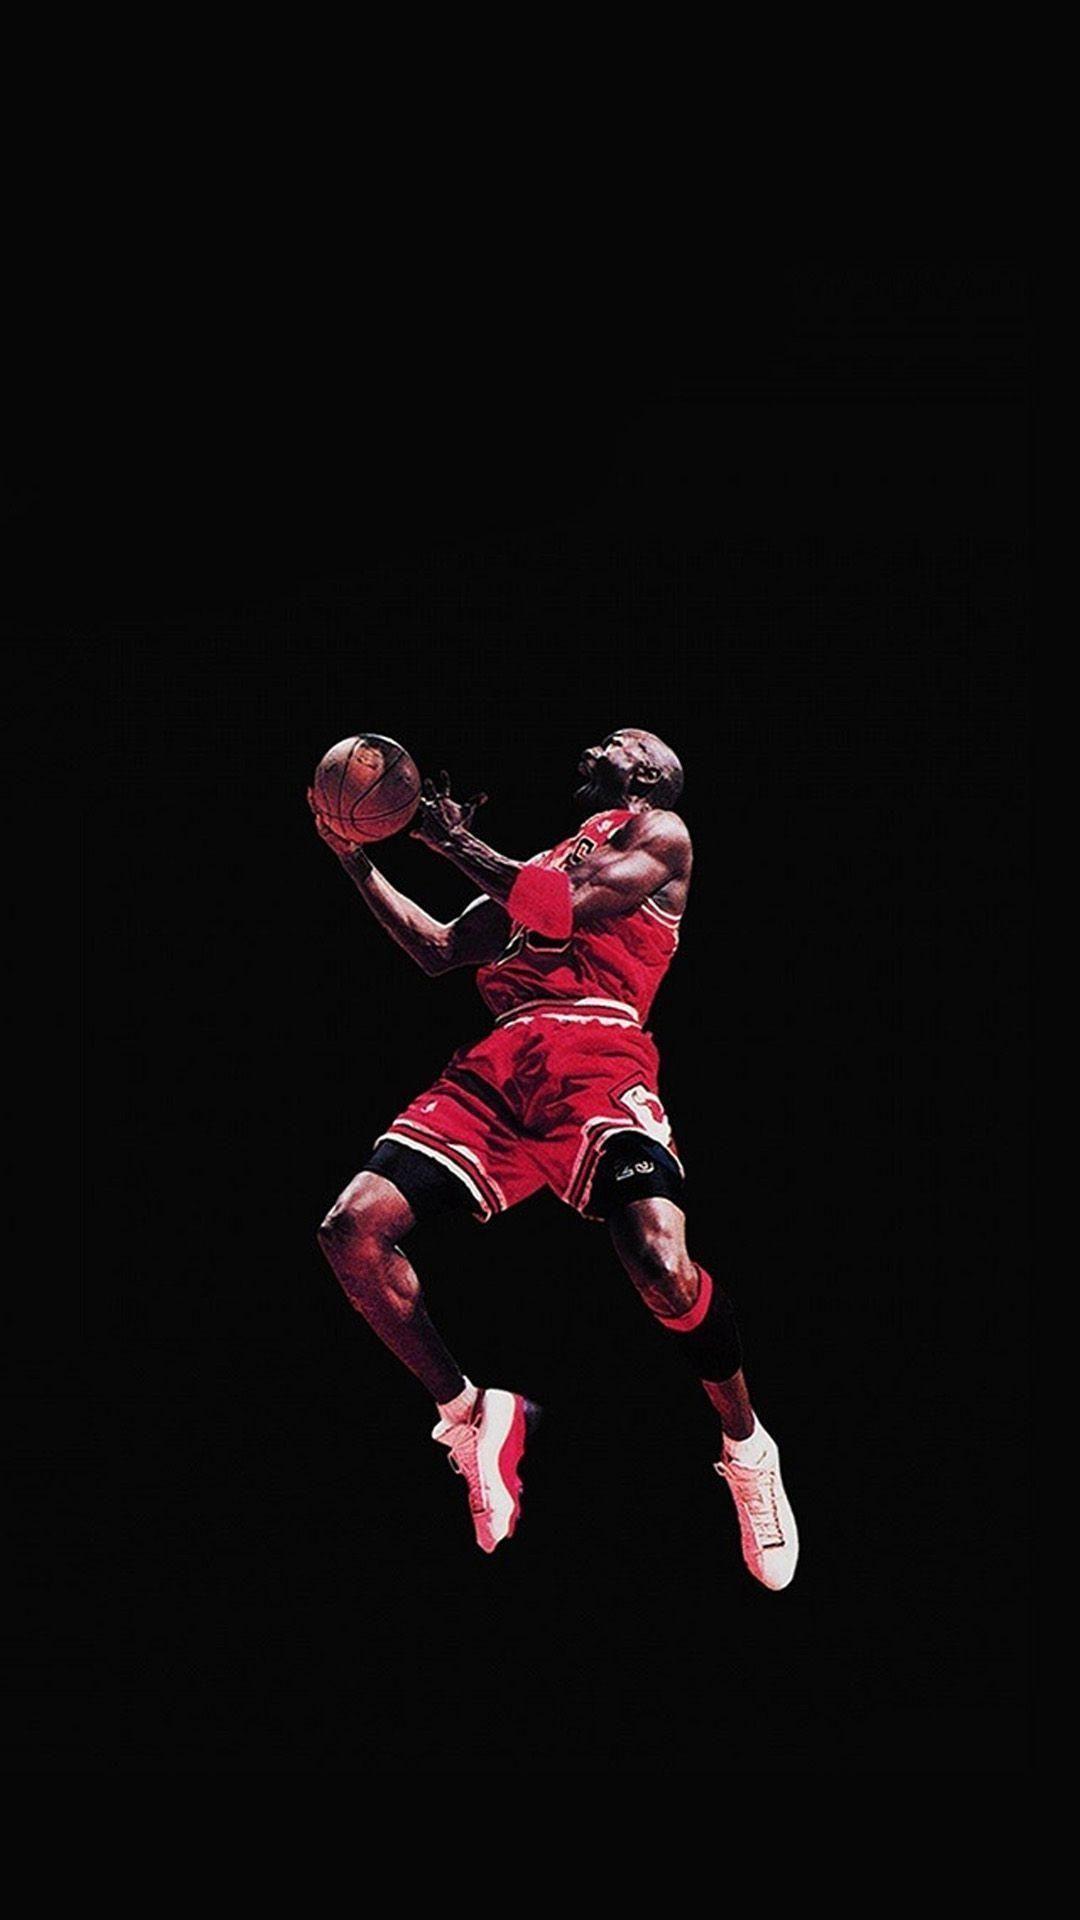 Download Cartoon Michael Jordan Wallpaper Mobile On High Quality Wallpaper On Hdwall In 2020 Michael Jordan Wallpaper Iphone Michael Jordan Pictures Michael Jordan Art